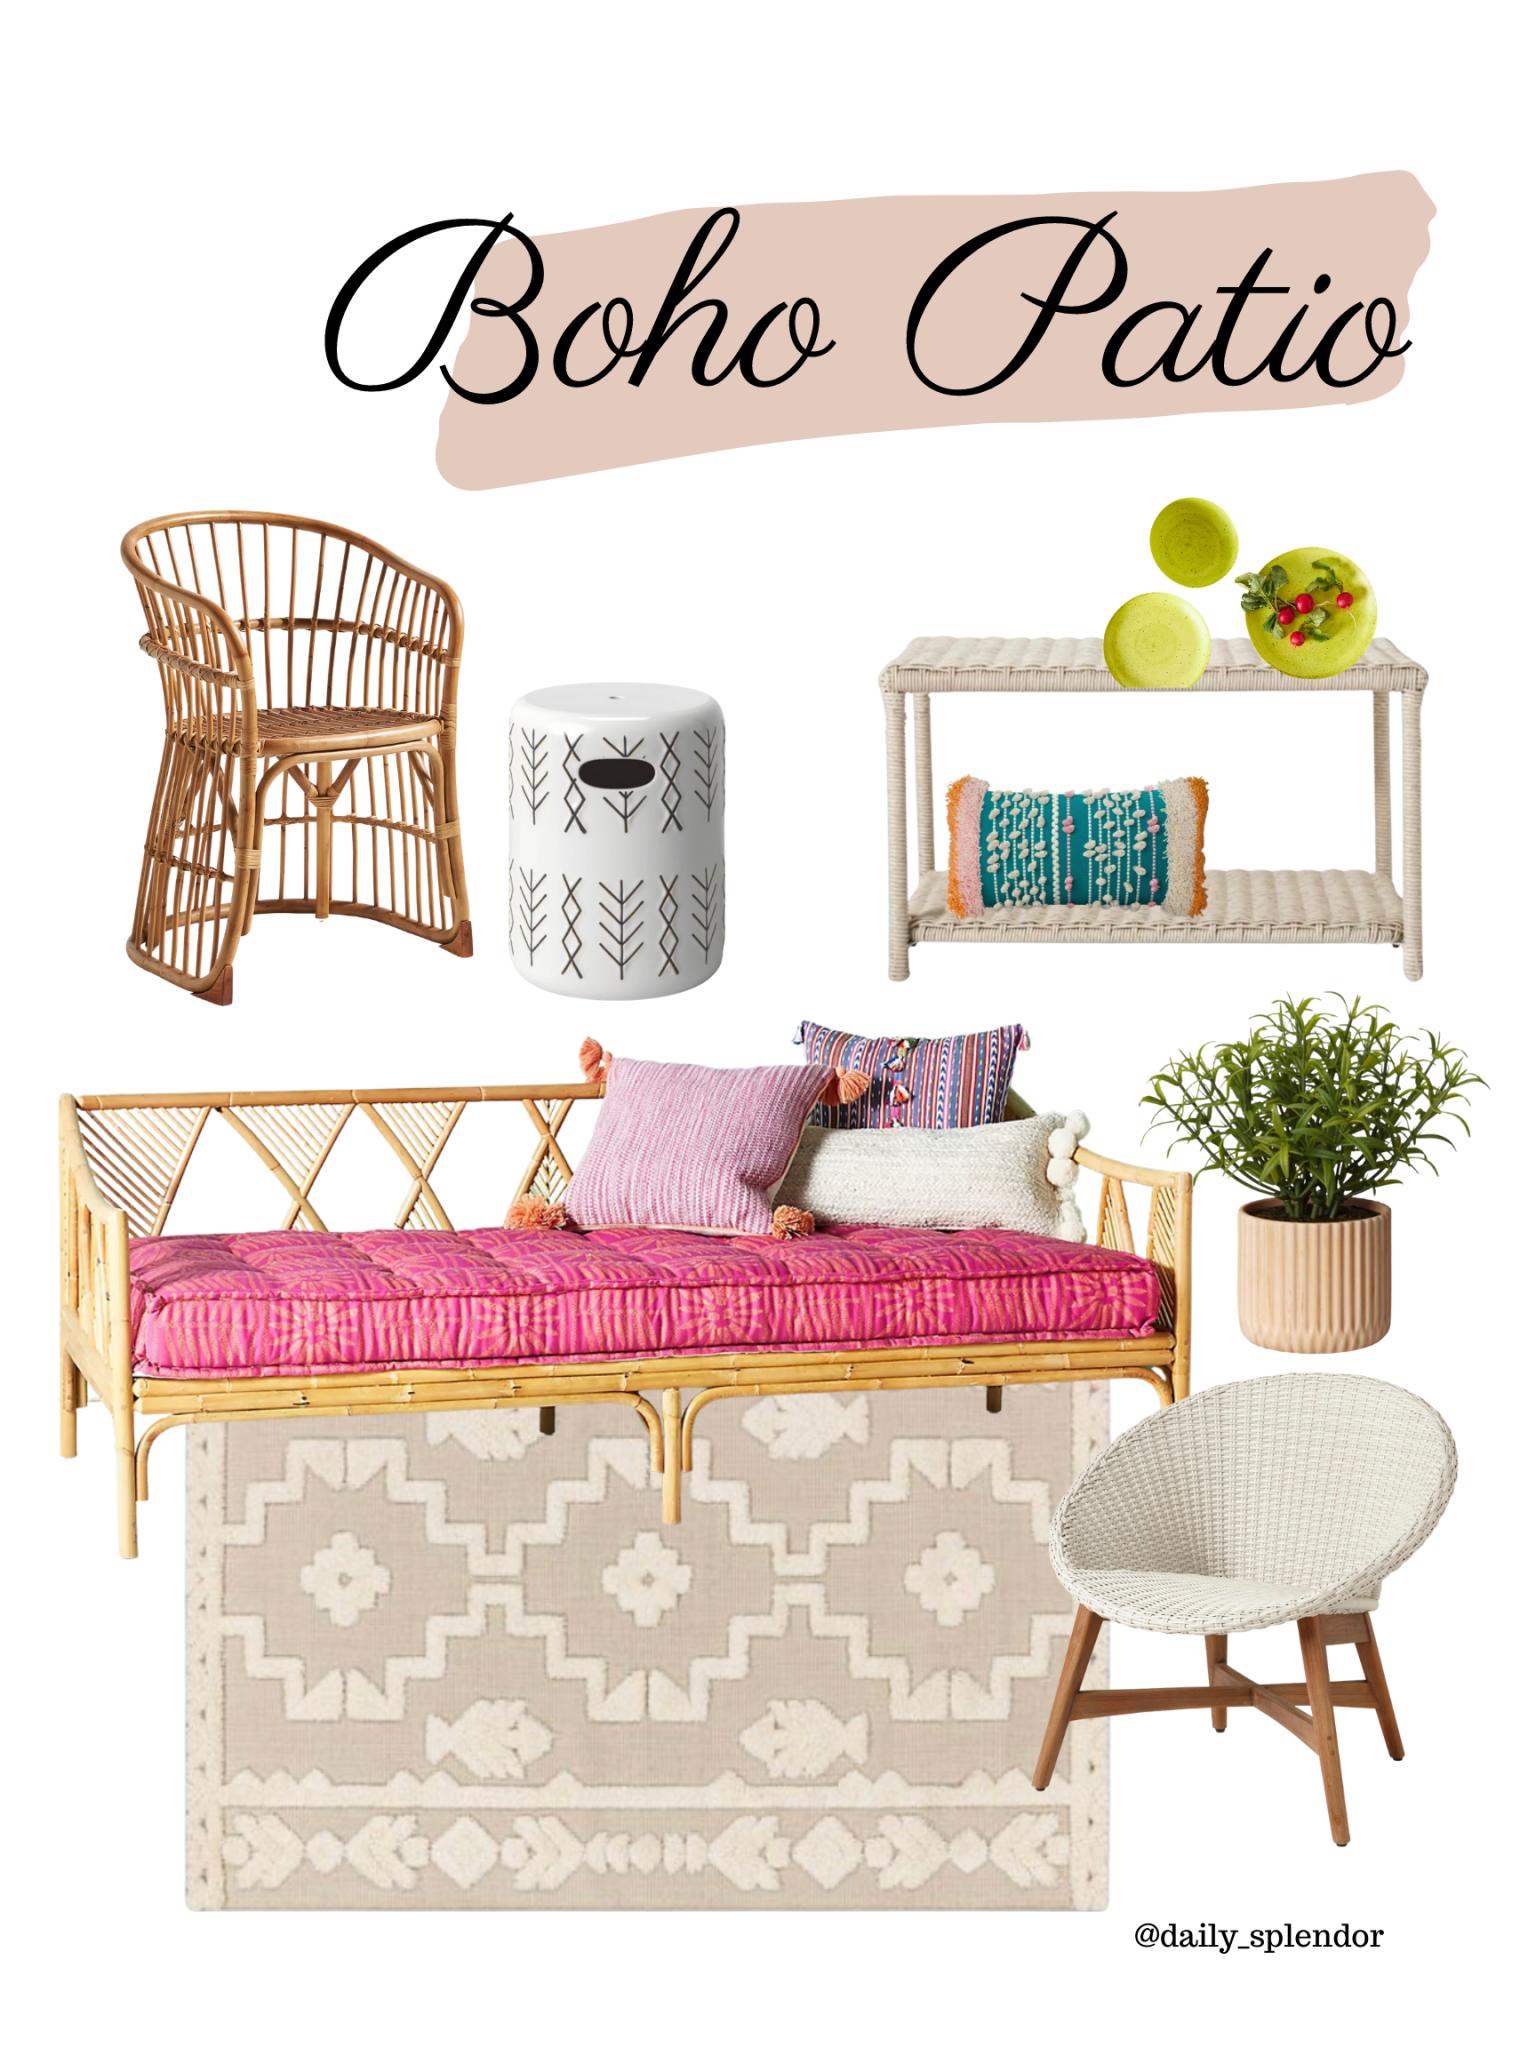 Patio refresh ideas | Daily Splendor Life and Style Blog | Boho patio vibe #outdoorfurniture #outdoorliving #summertime #patiodecor #patiofurniture #potterybarn #targetstyle #anthropologie #bohodesign